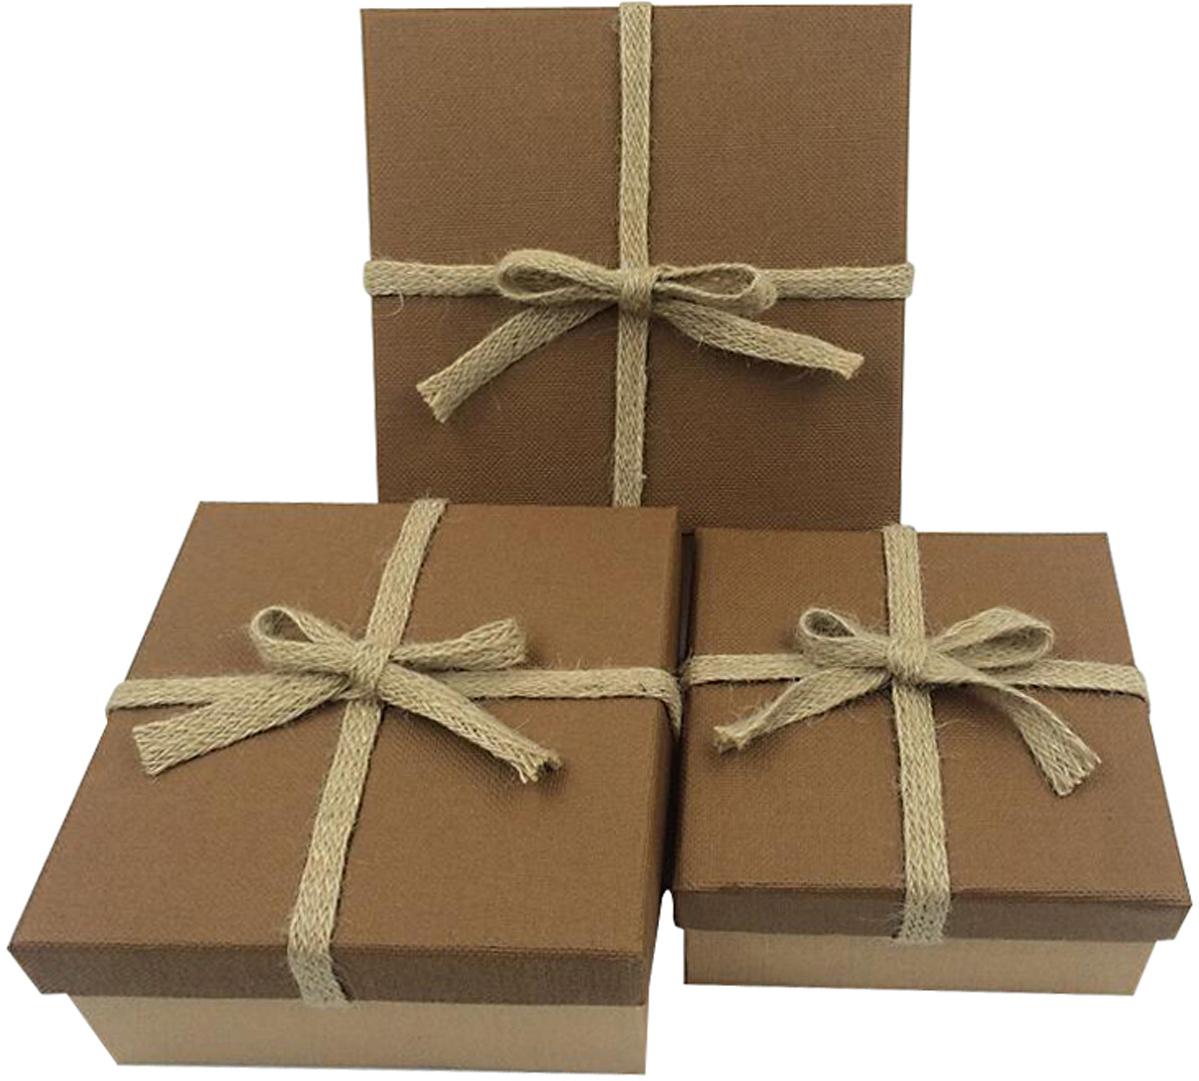 Набор подарочных коробок Veld-Co Молочный шоколад, 3 шт набор подарочных коробок veld co нежный париж 3 шт